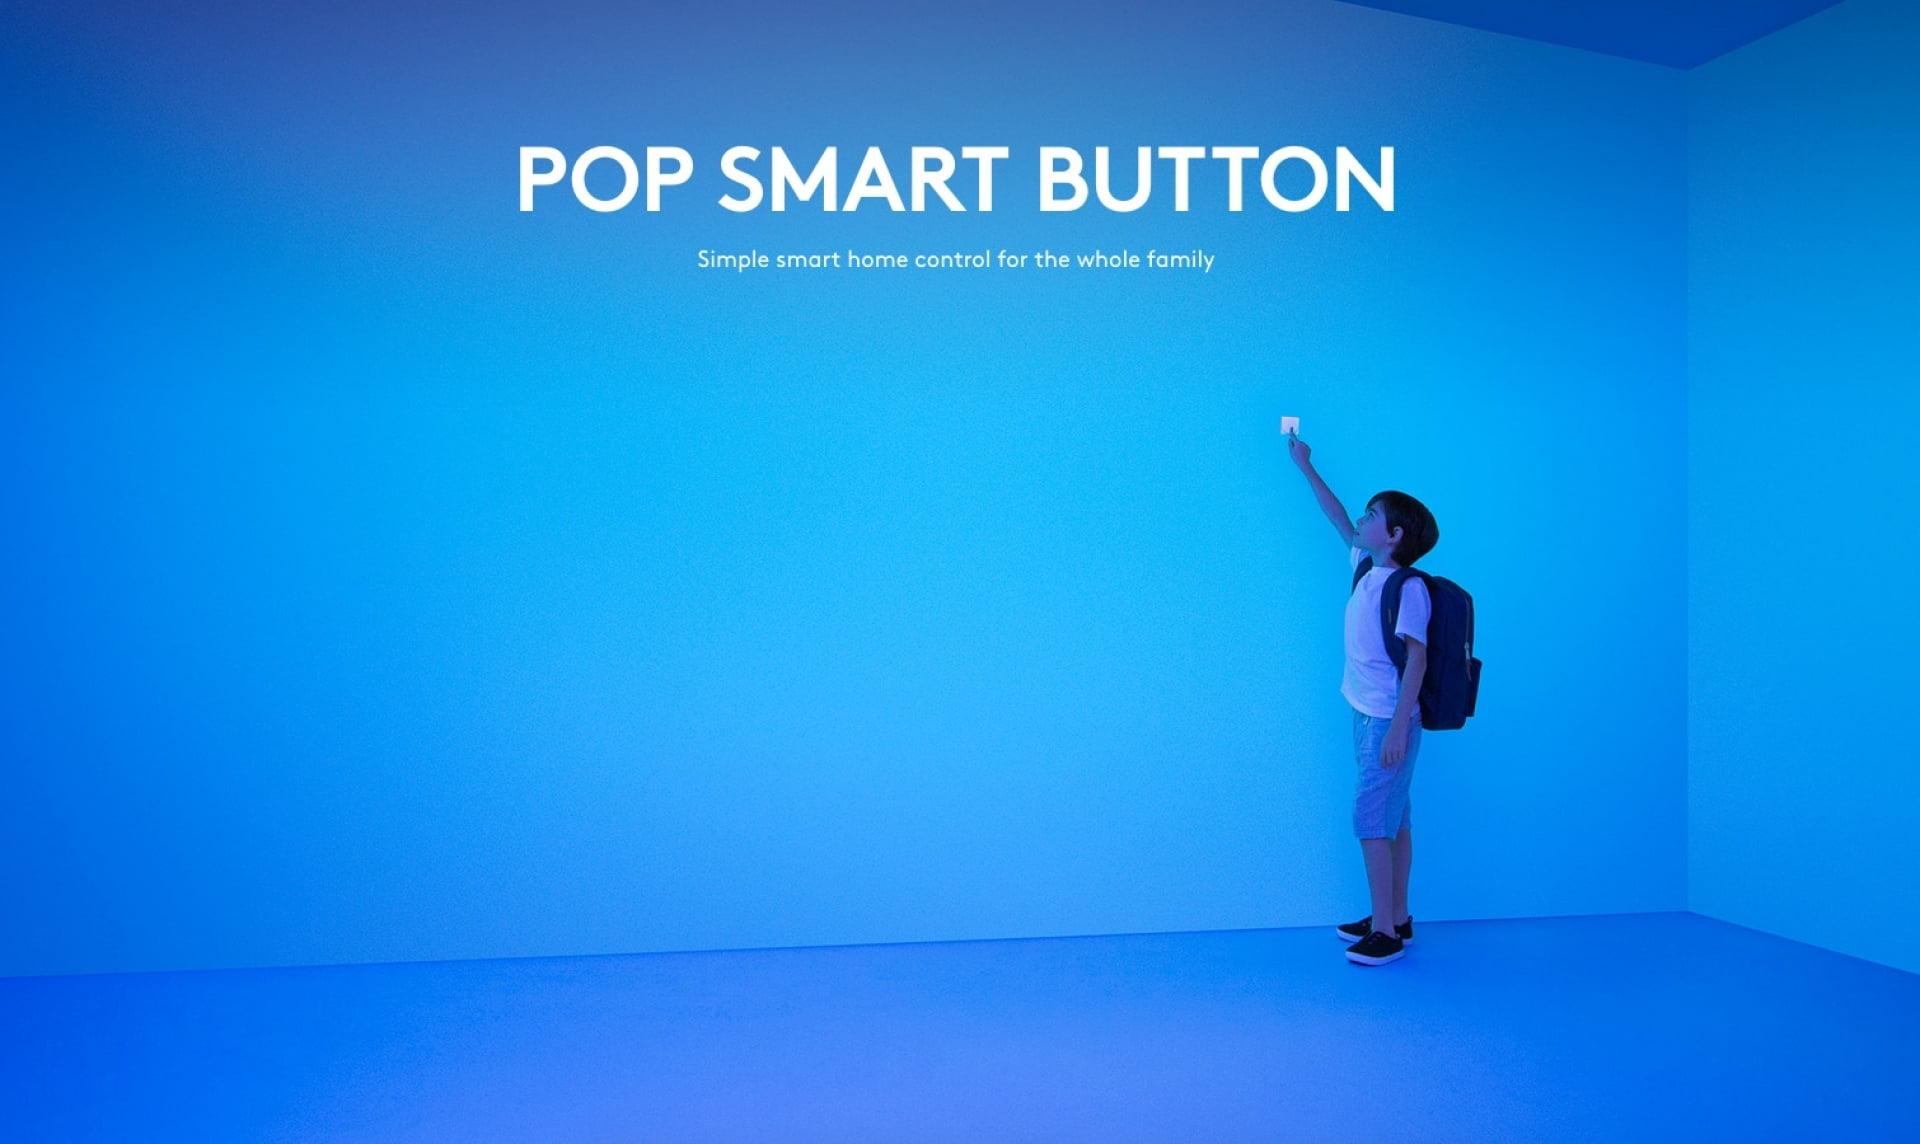 Logitech Unveils New POP Smart Button With Apple HomeKit Support